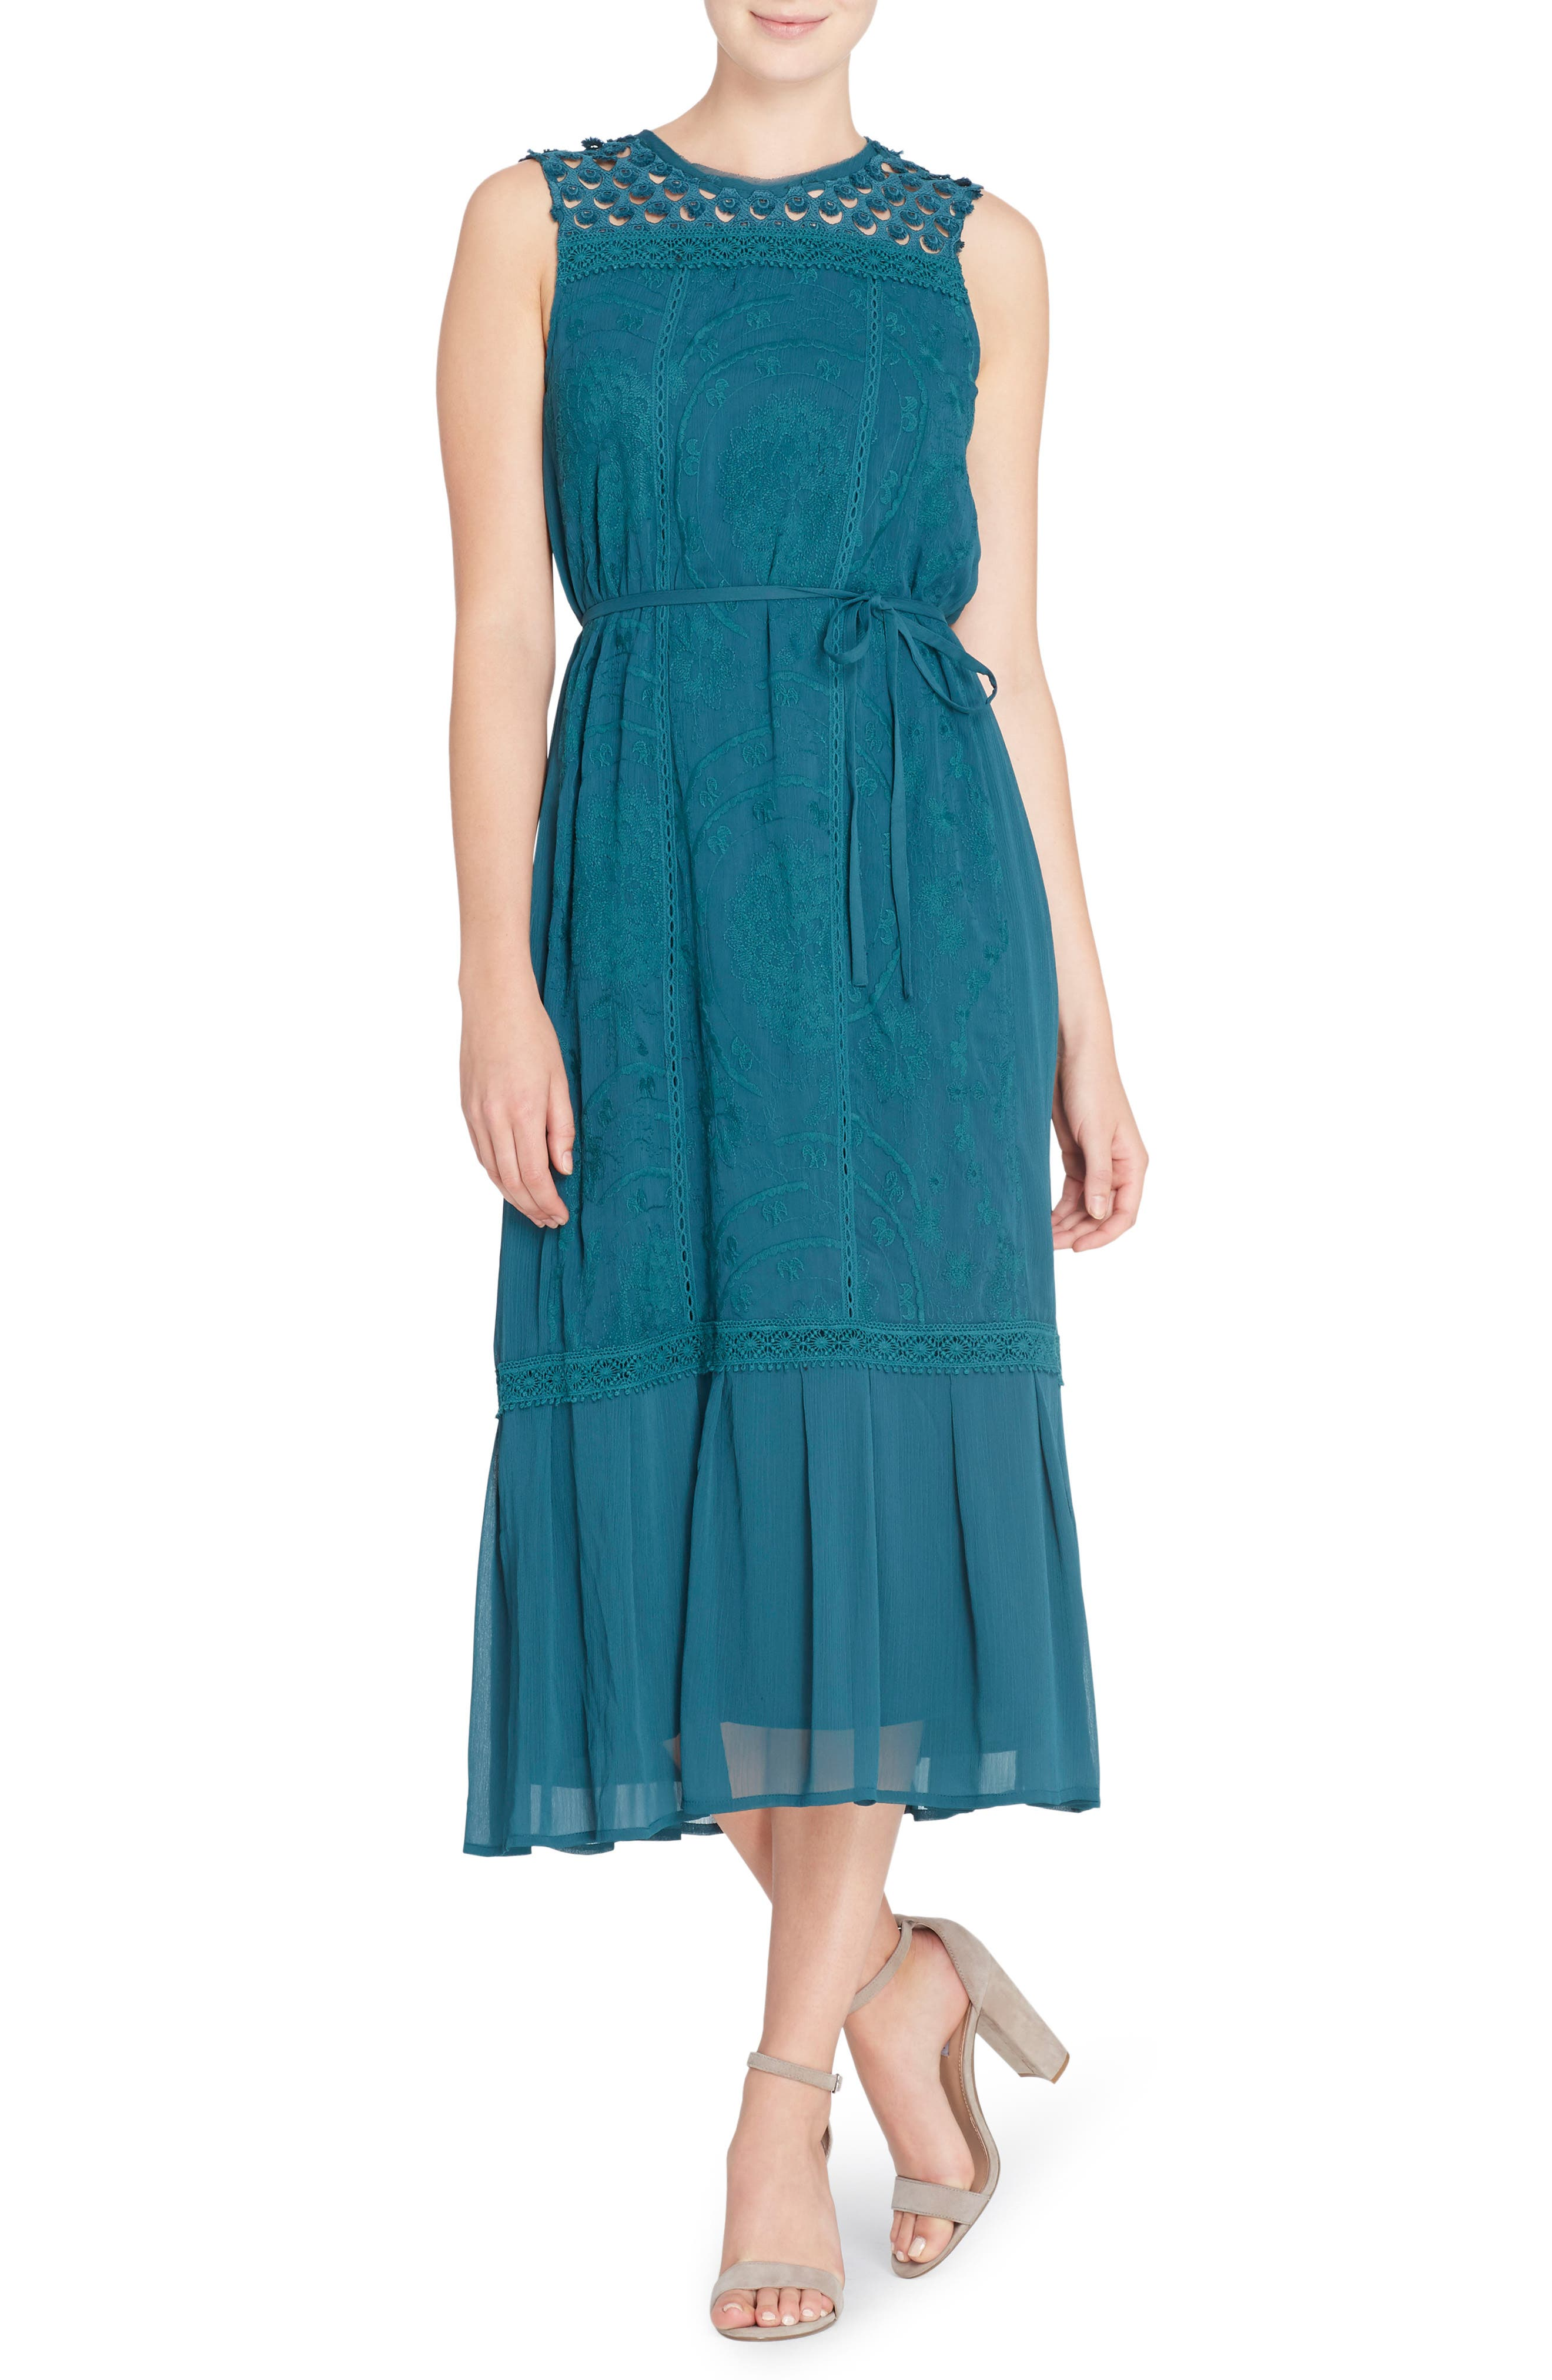 Ellen Embroidered Midi Dress,                         Main,                         color, Deep Teal